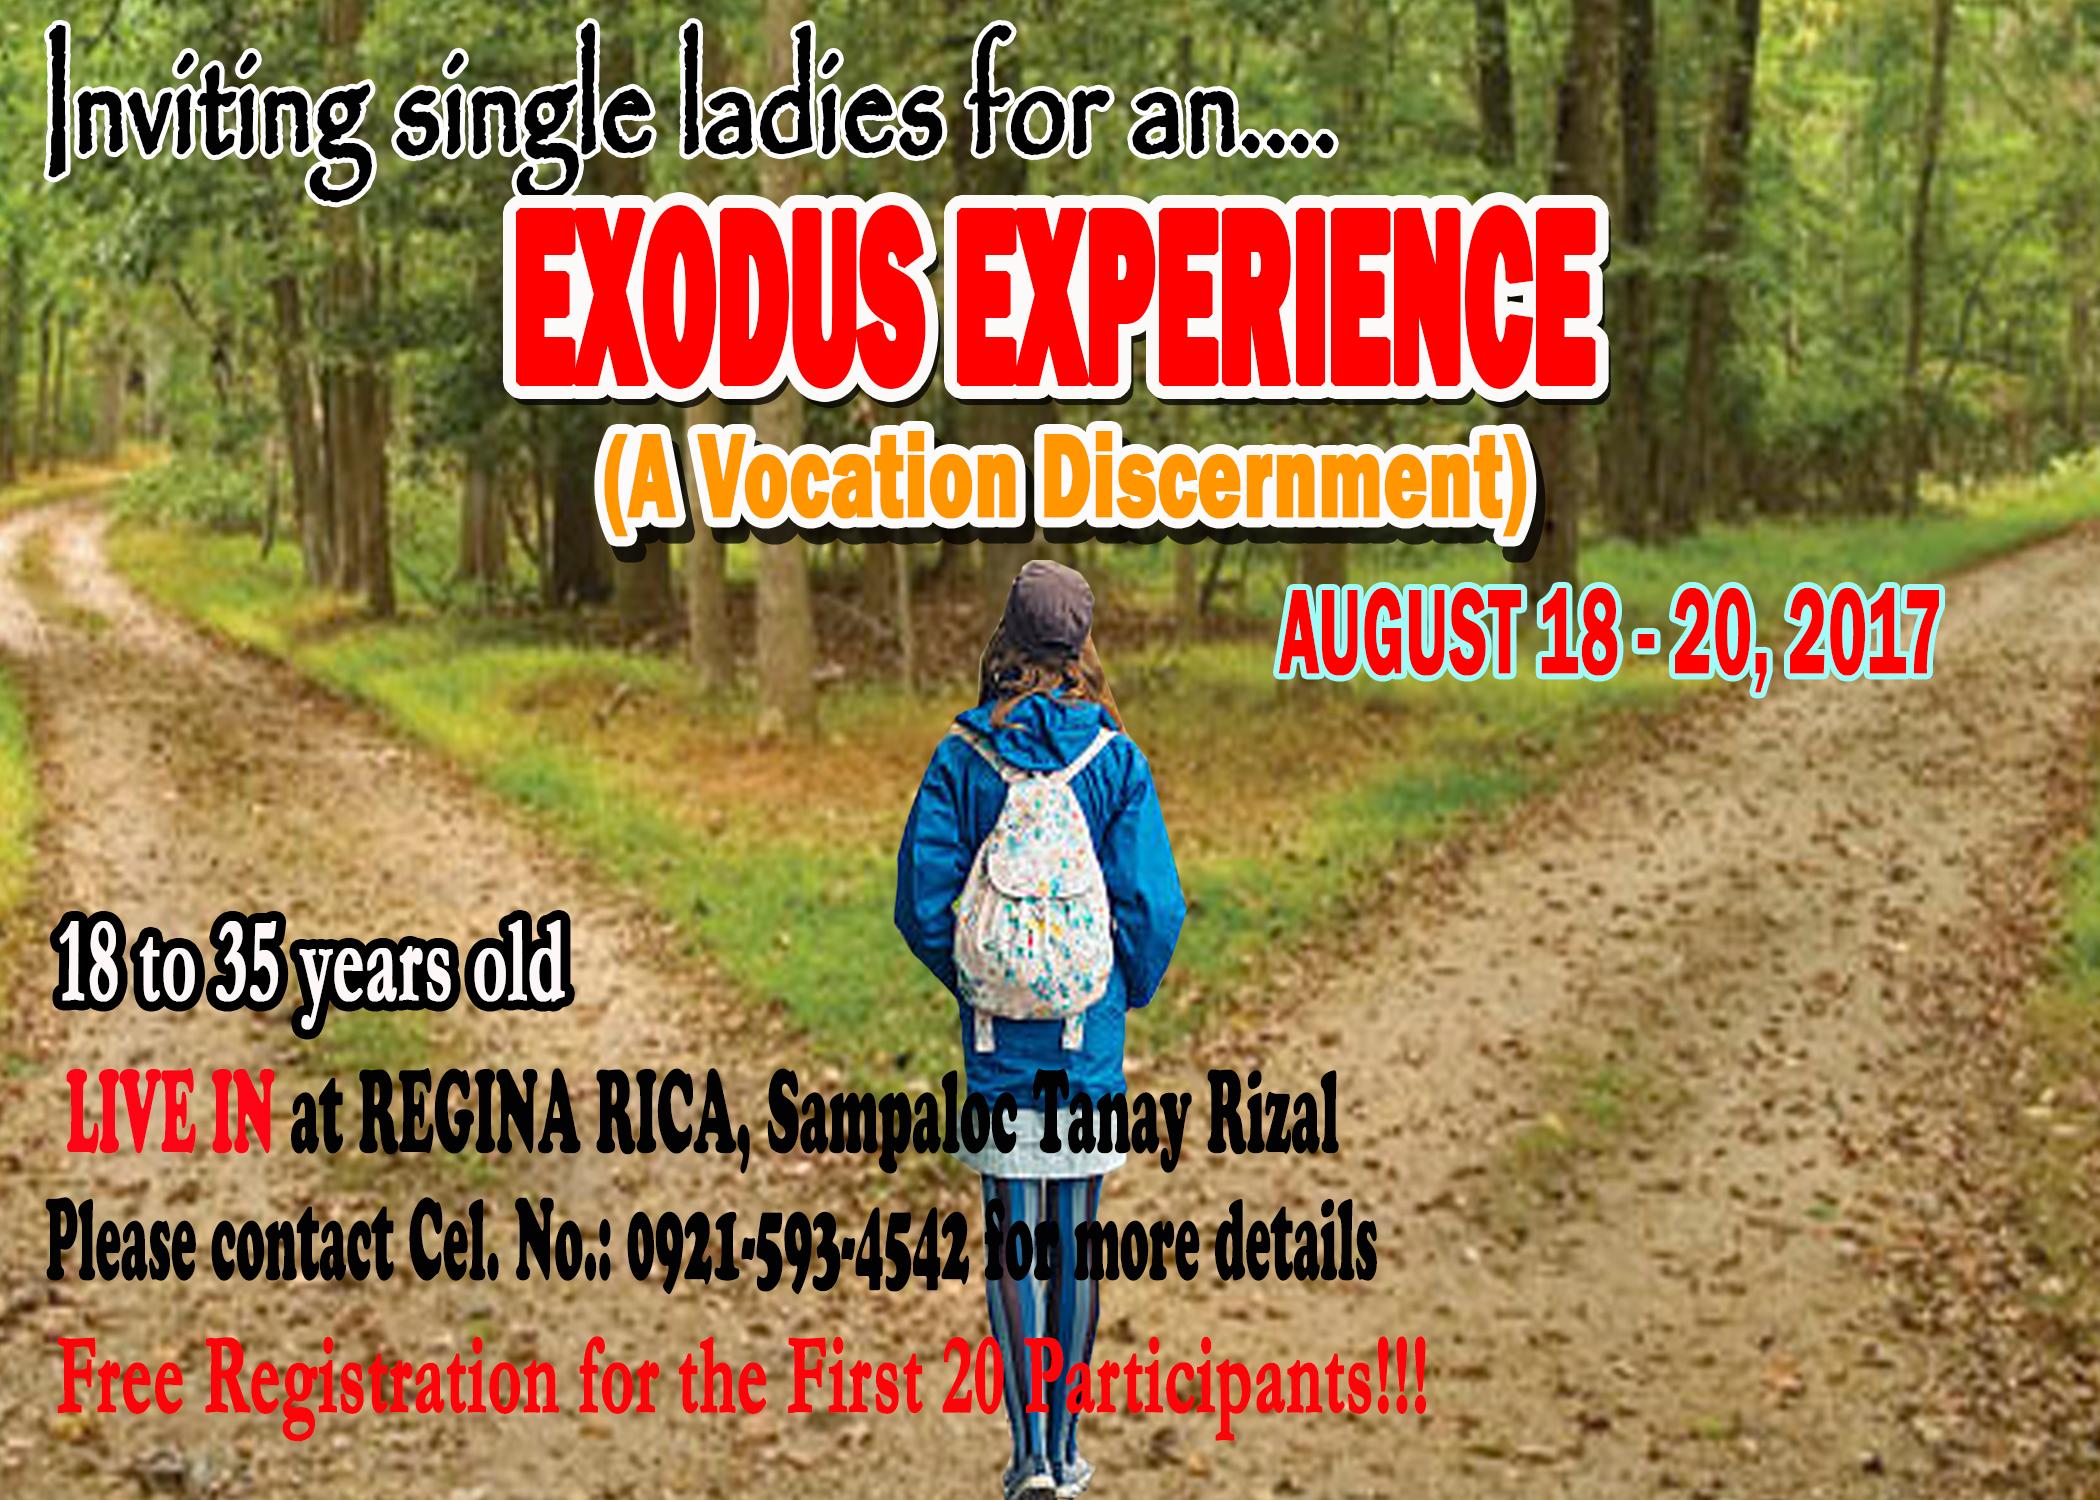 Poster for Exodus 3